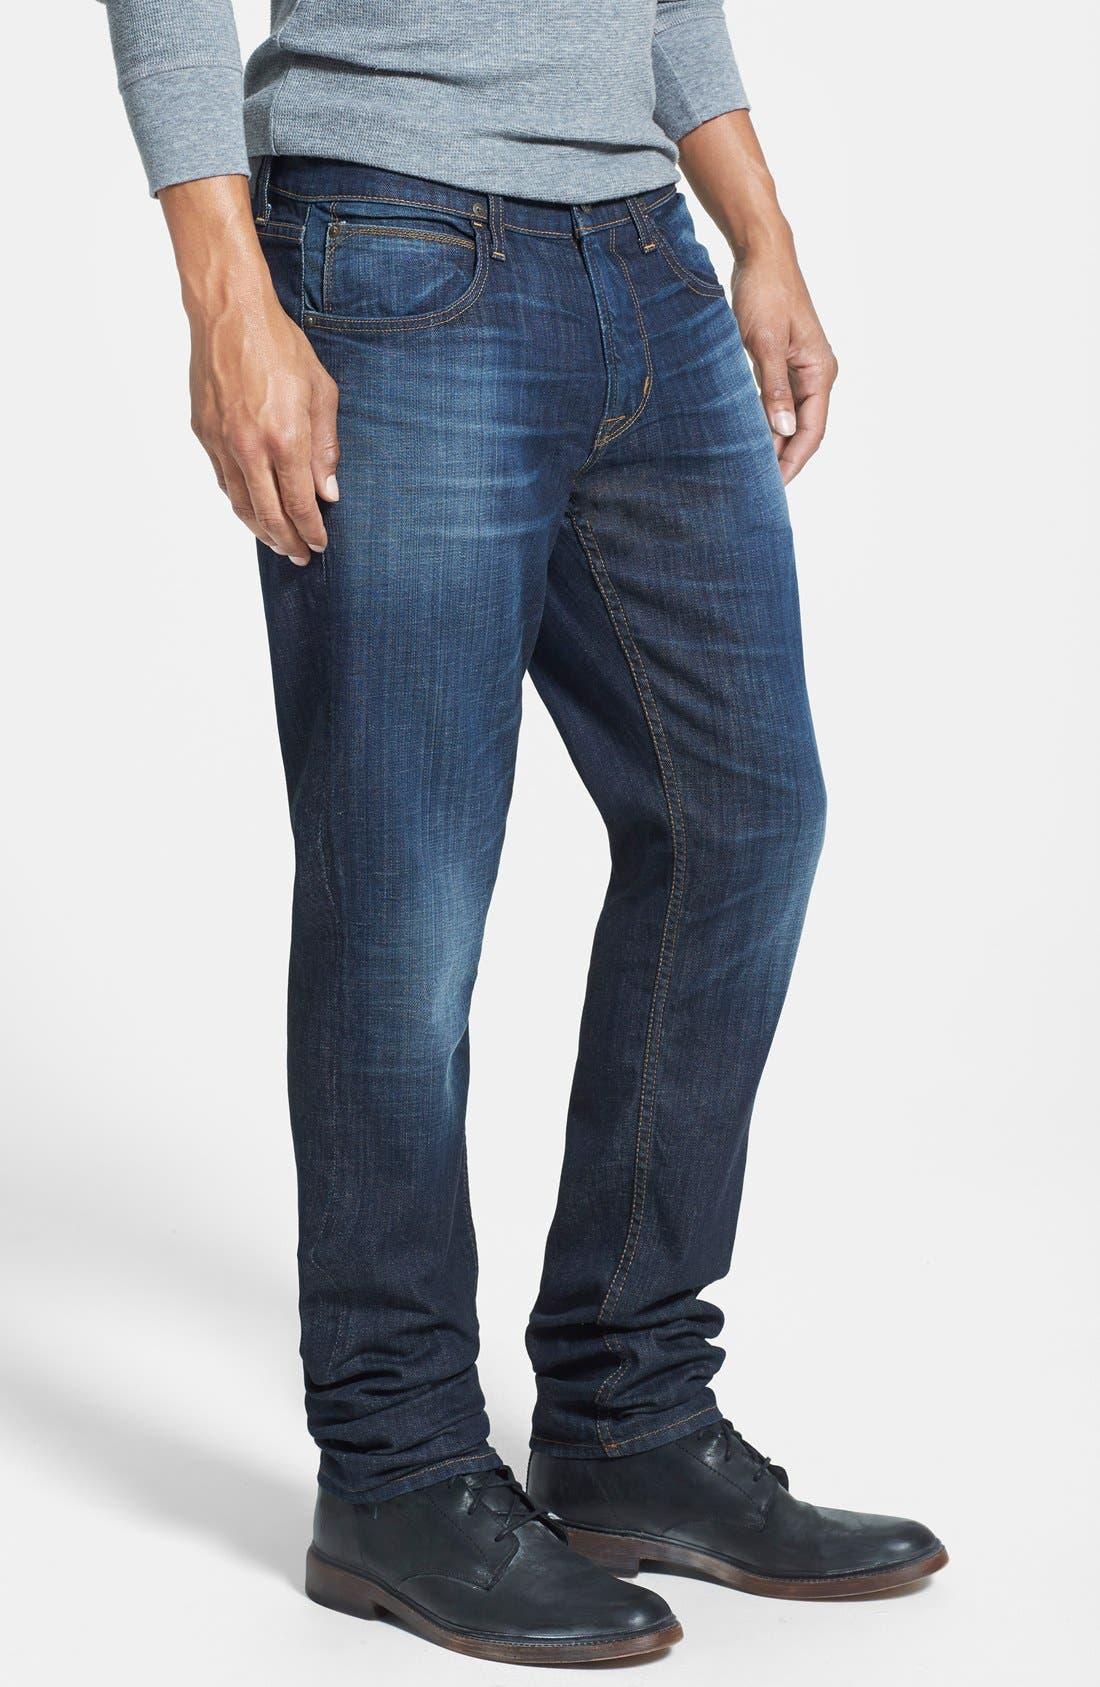 HUDSON JEANS, 'Blake' Slim Fit Jeans, Alternate thumbnail 4, color, 409